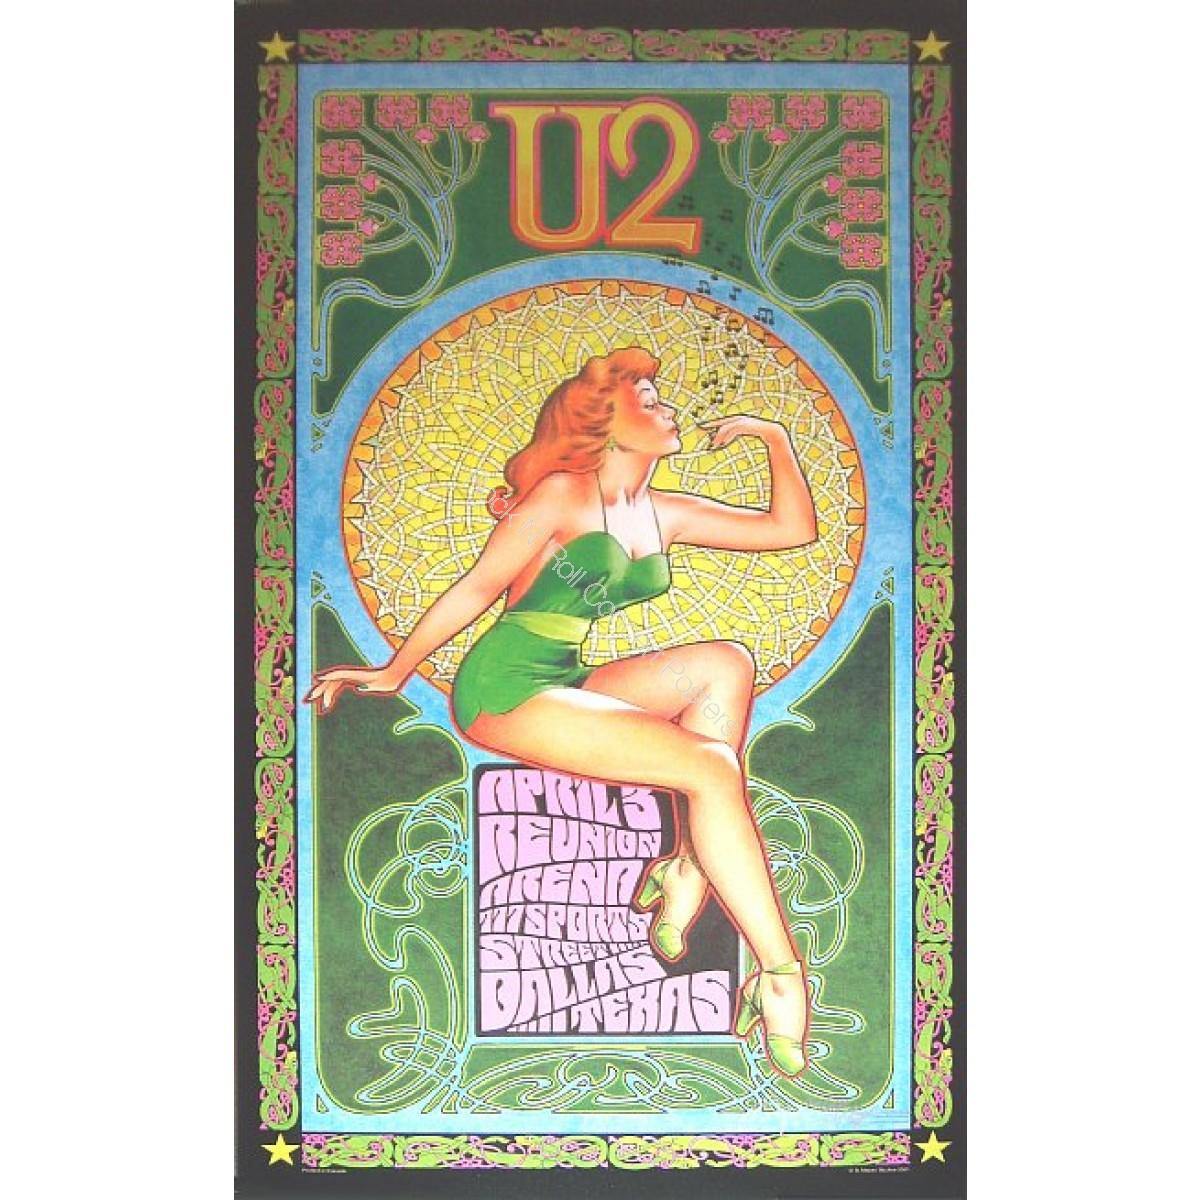 U2 Reunion Arena Dallas Texas 4/3/01 1st printing